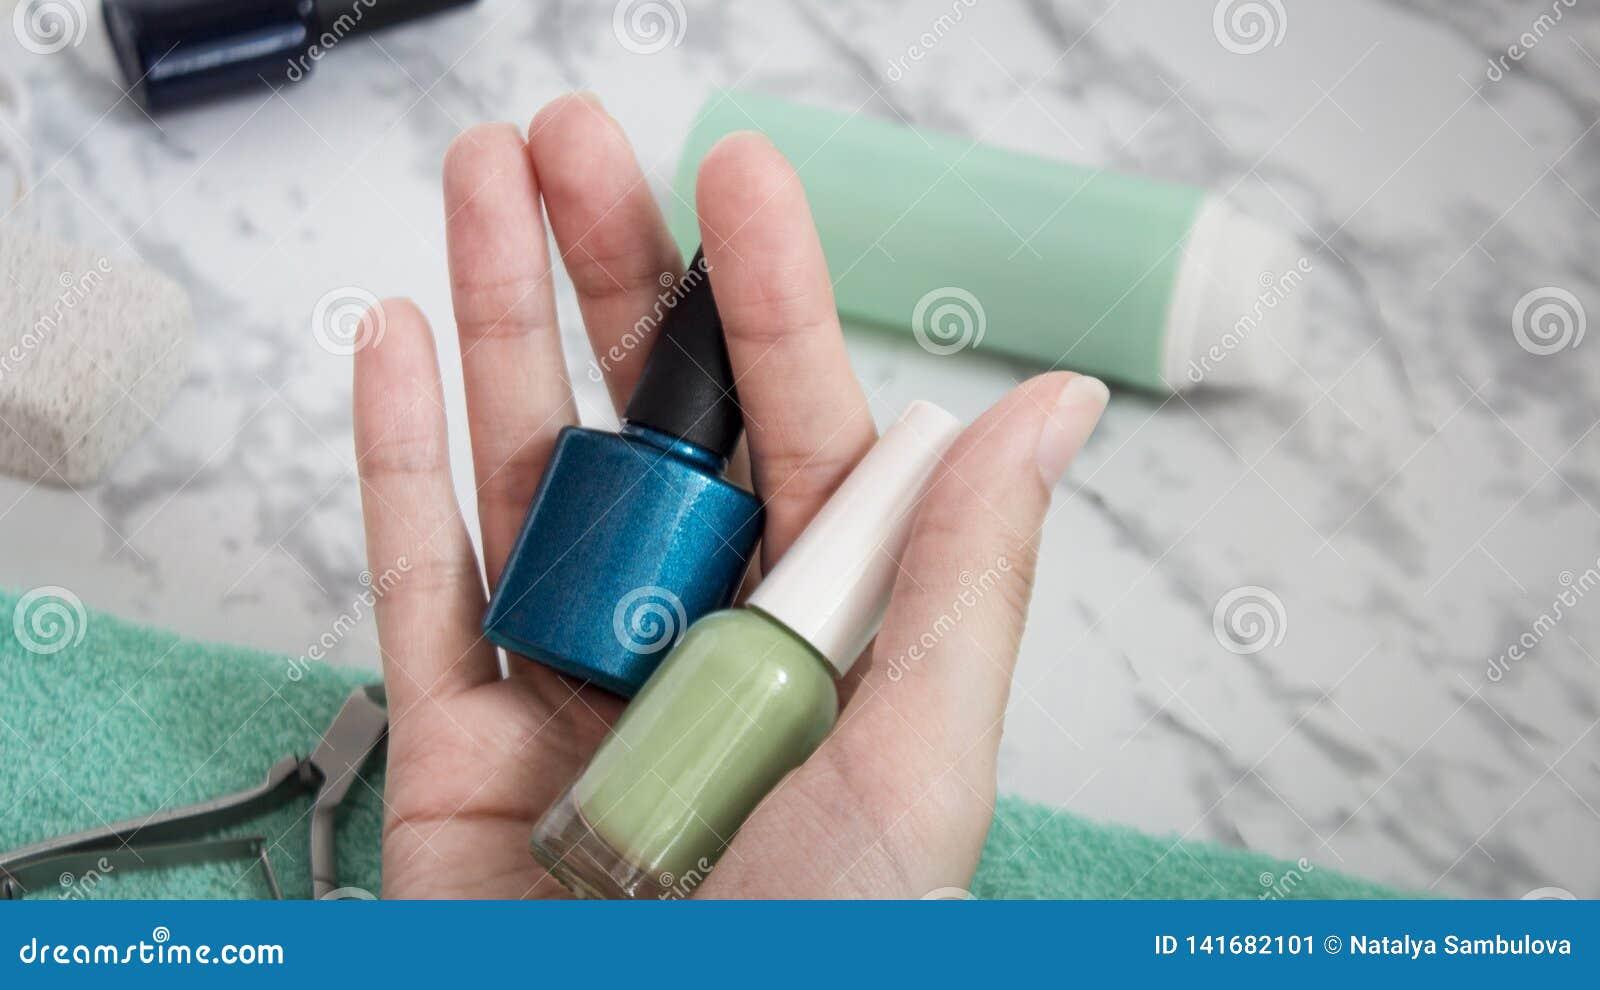 Дом заботы кожи руки, маникюр, салон спа, красота, мода, для женщин, маникюр